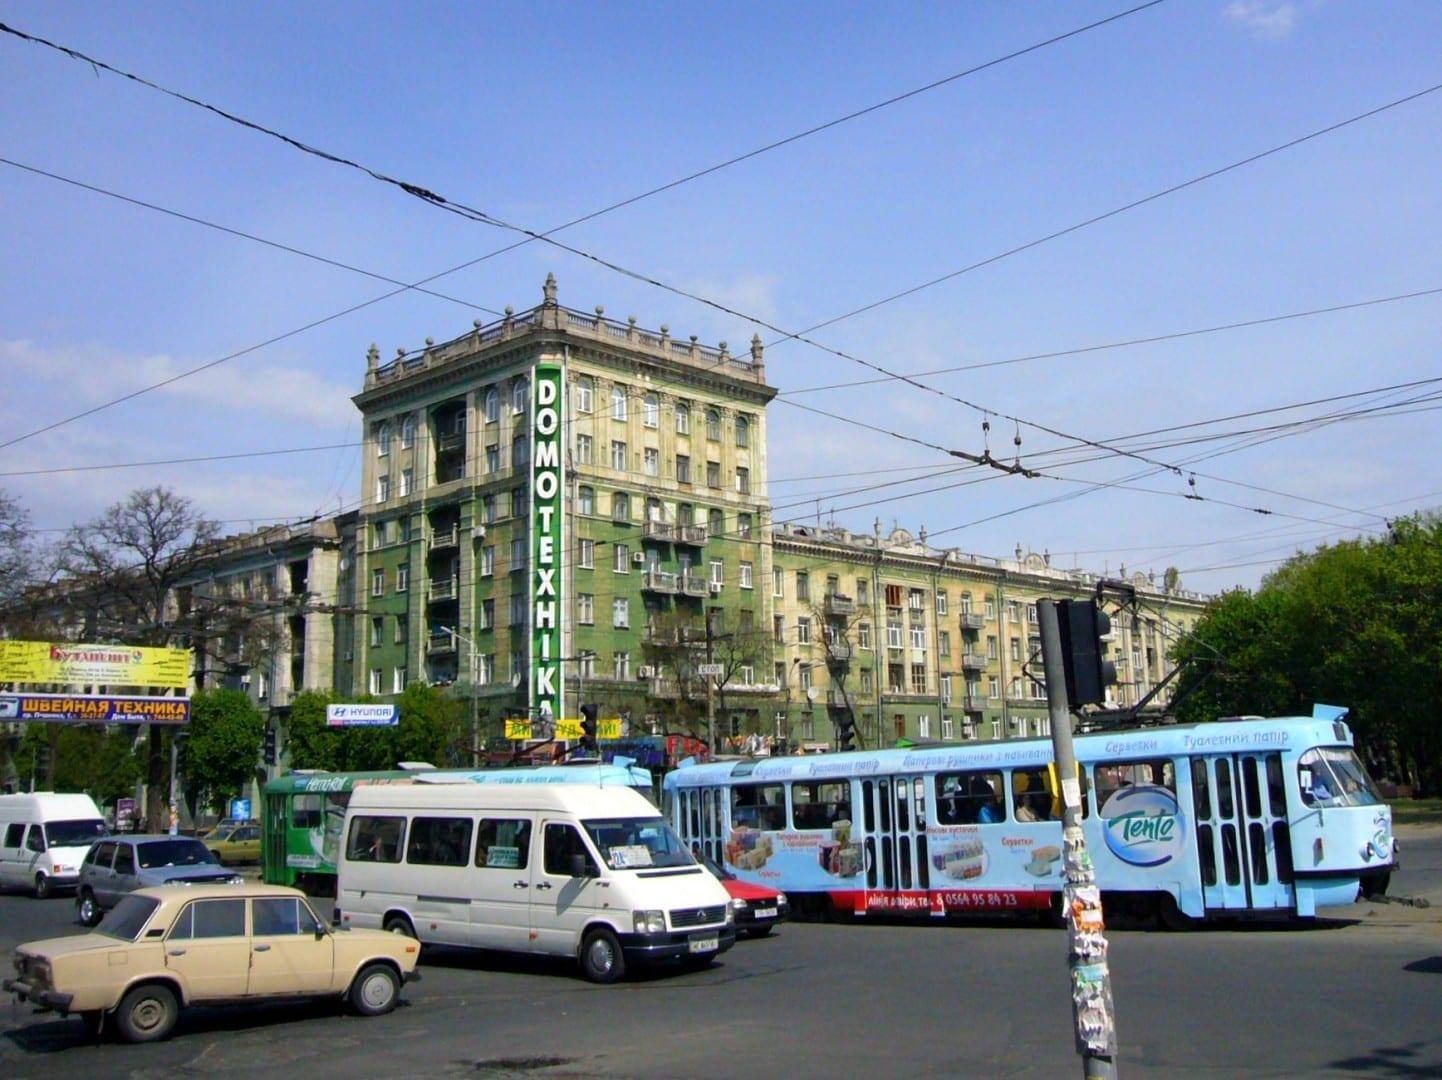 La avenida Dmytro Yavornytskiy en Dnipro Dnipro Ucrania